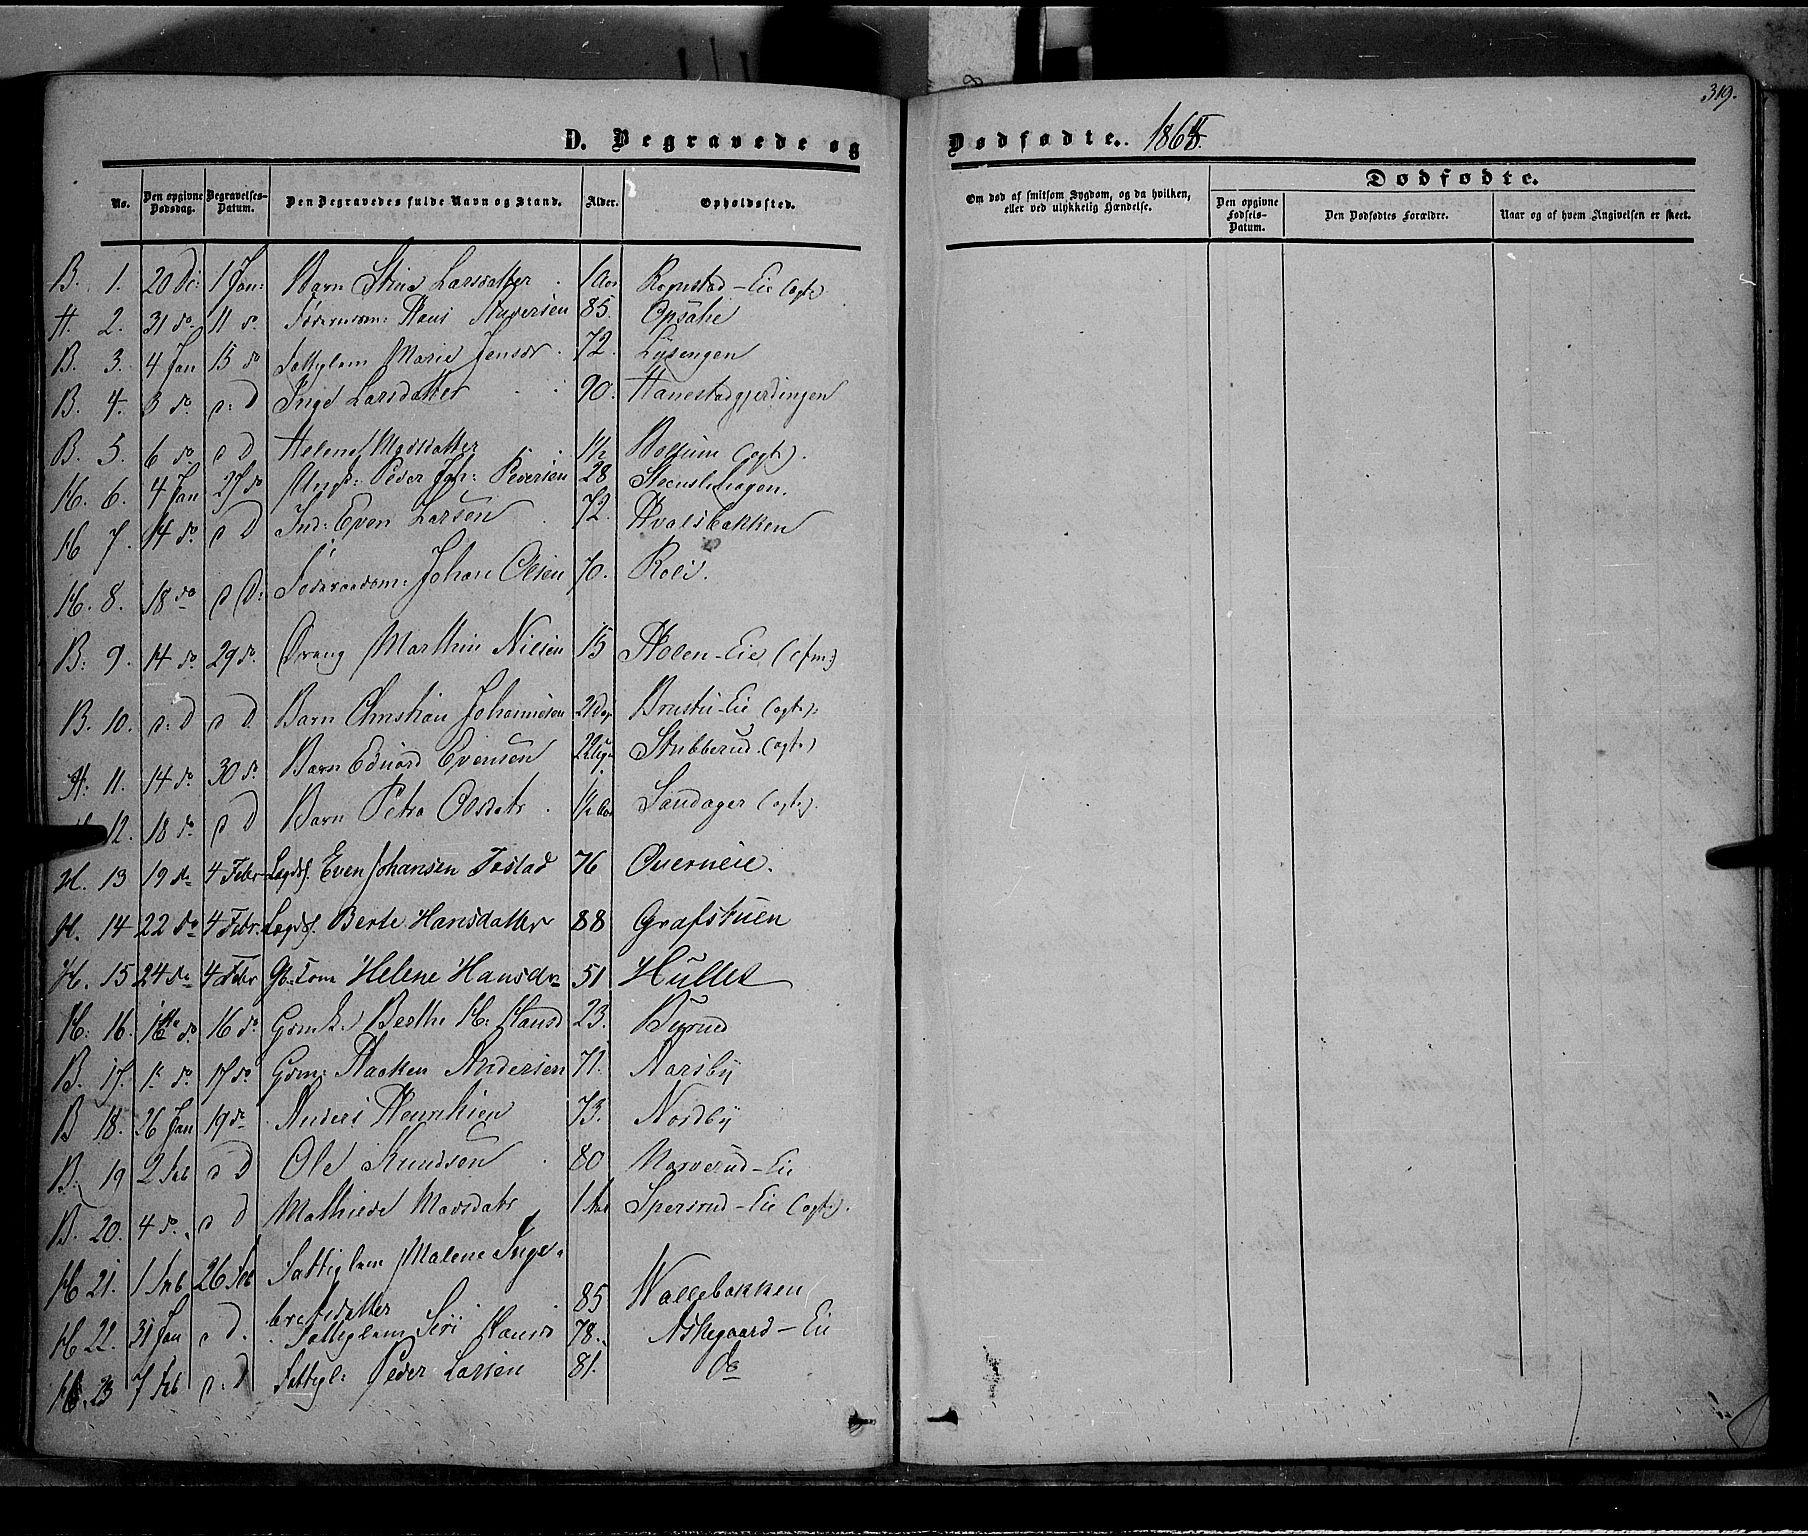 SAH, Østre Toten prestekontor, Ministerialbok nr. 4, 1857-1865, s. 319